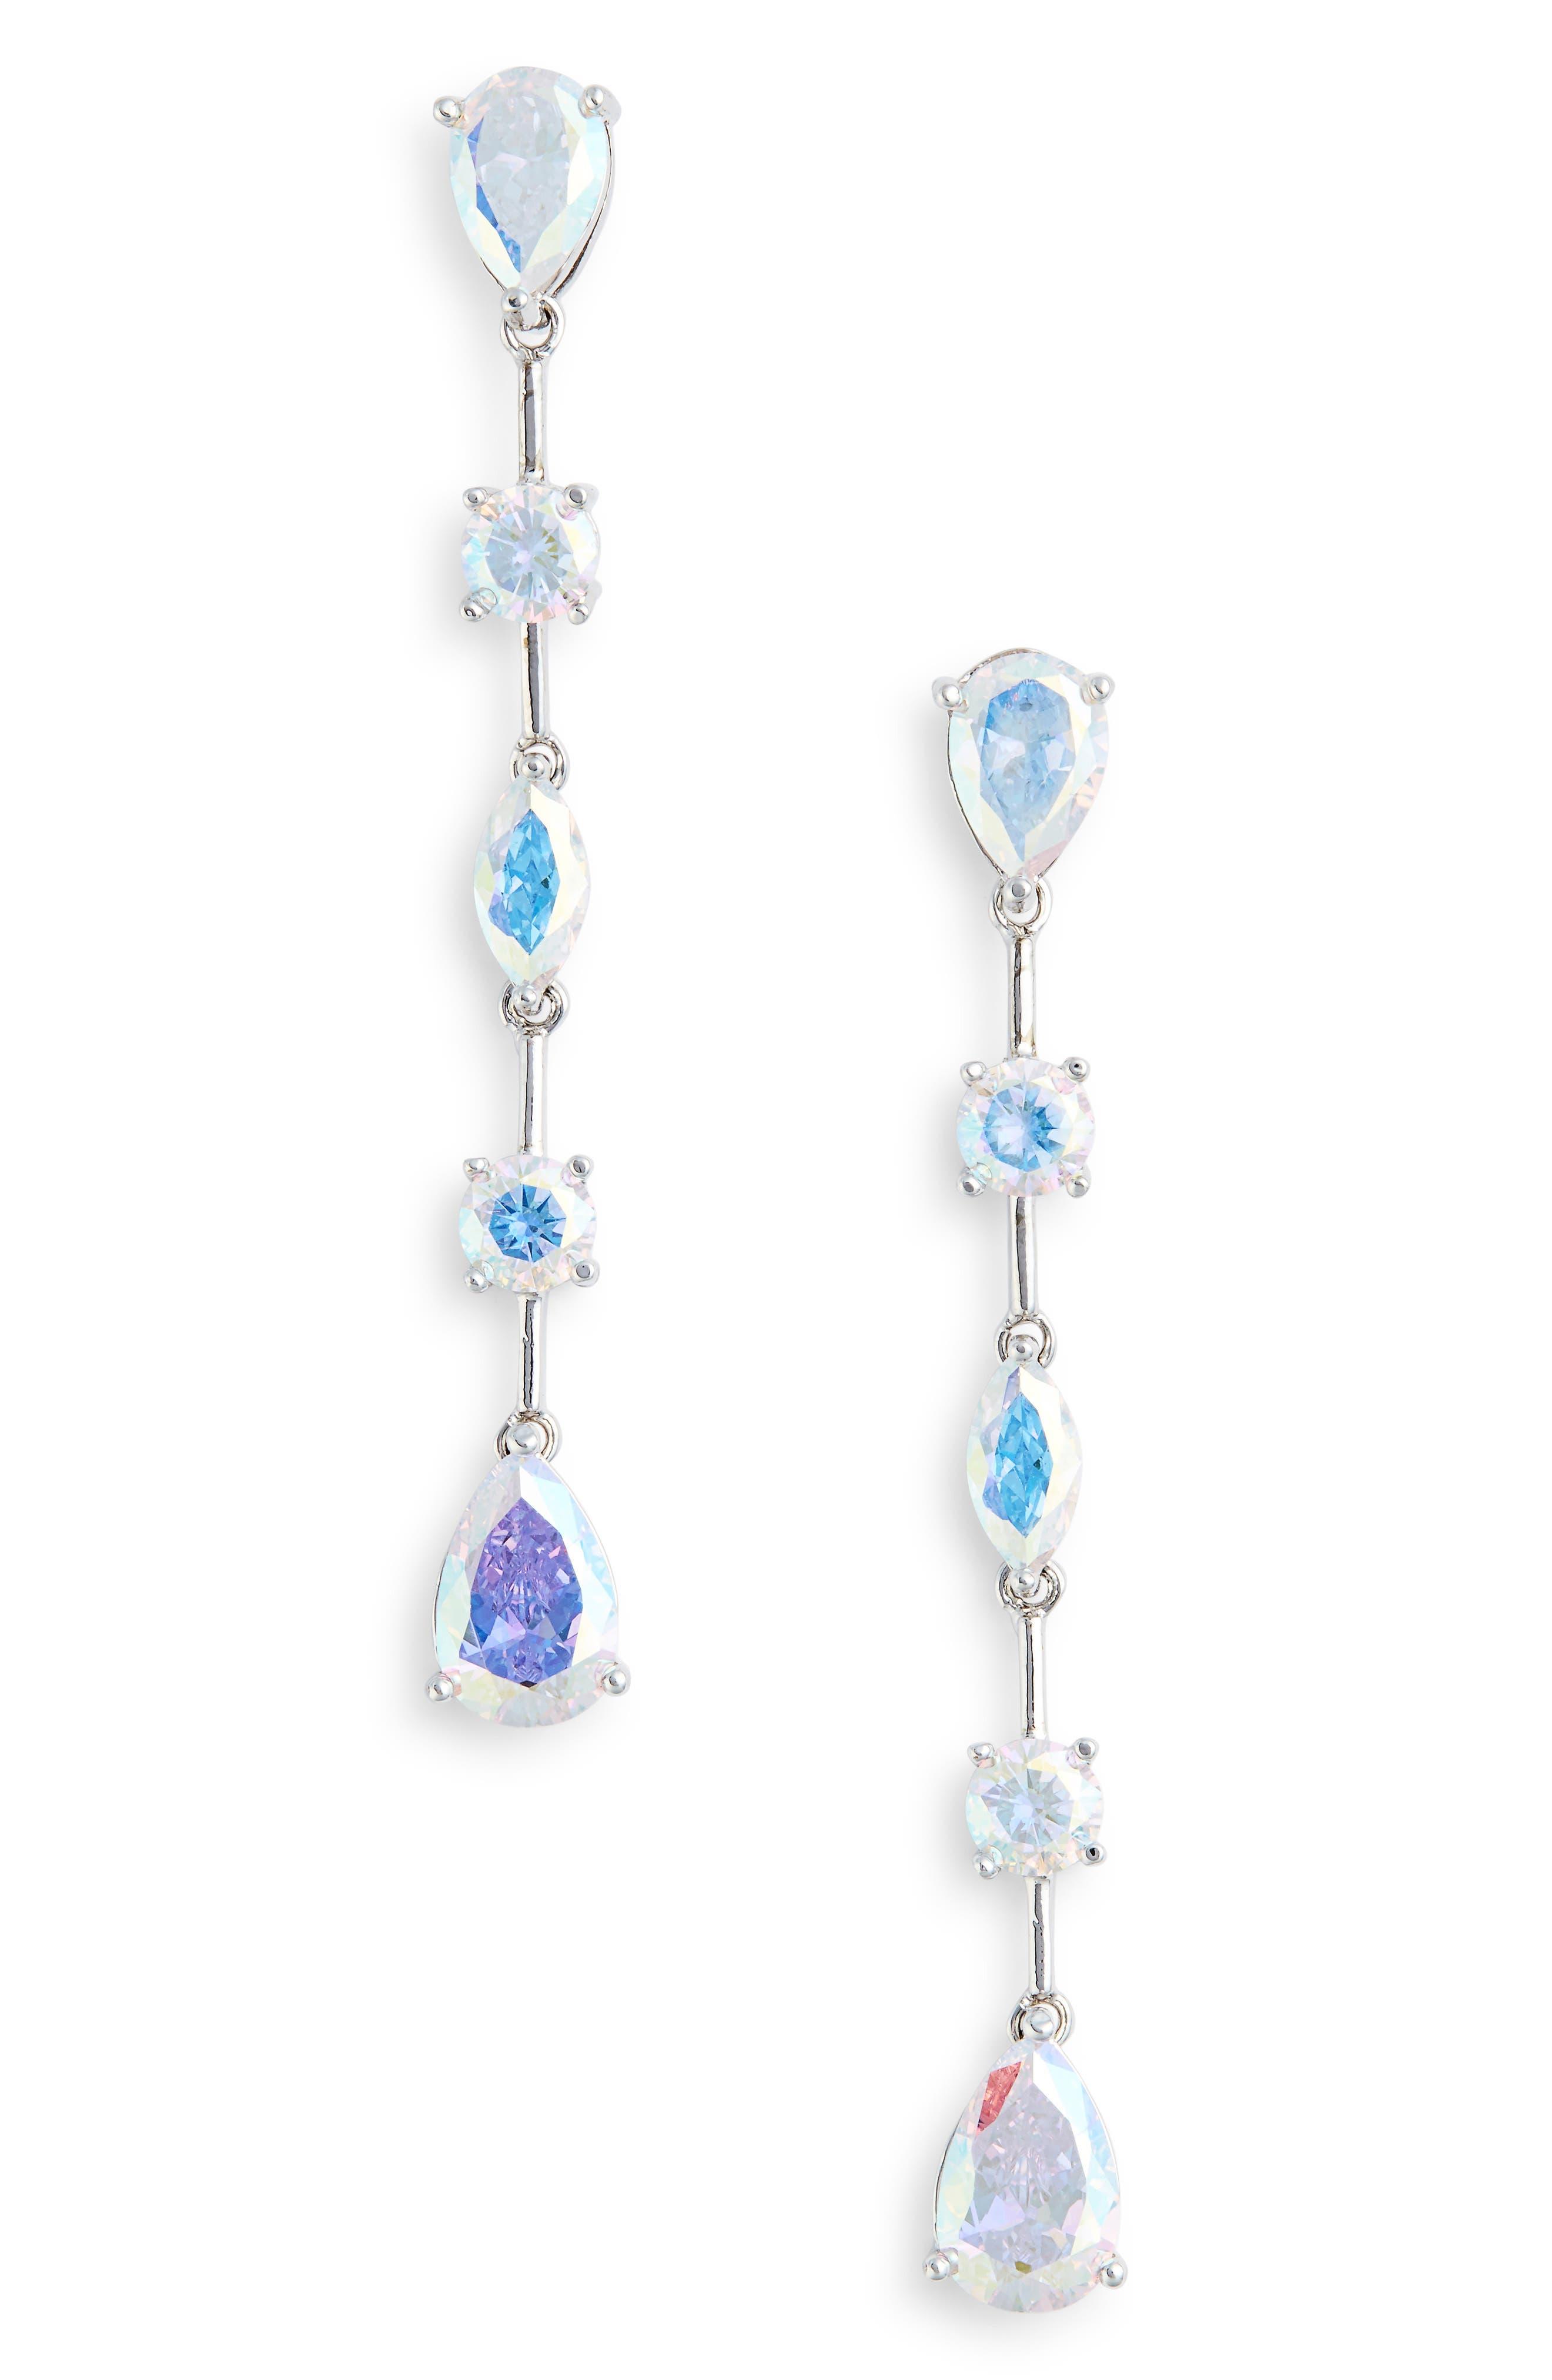 Cubic Zirconia Linear Drop Earrings,                         Main,                         color, Silver/ Light Crystal